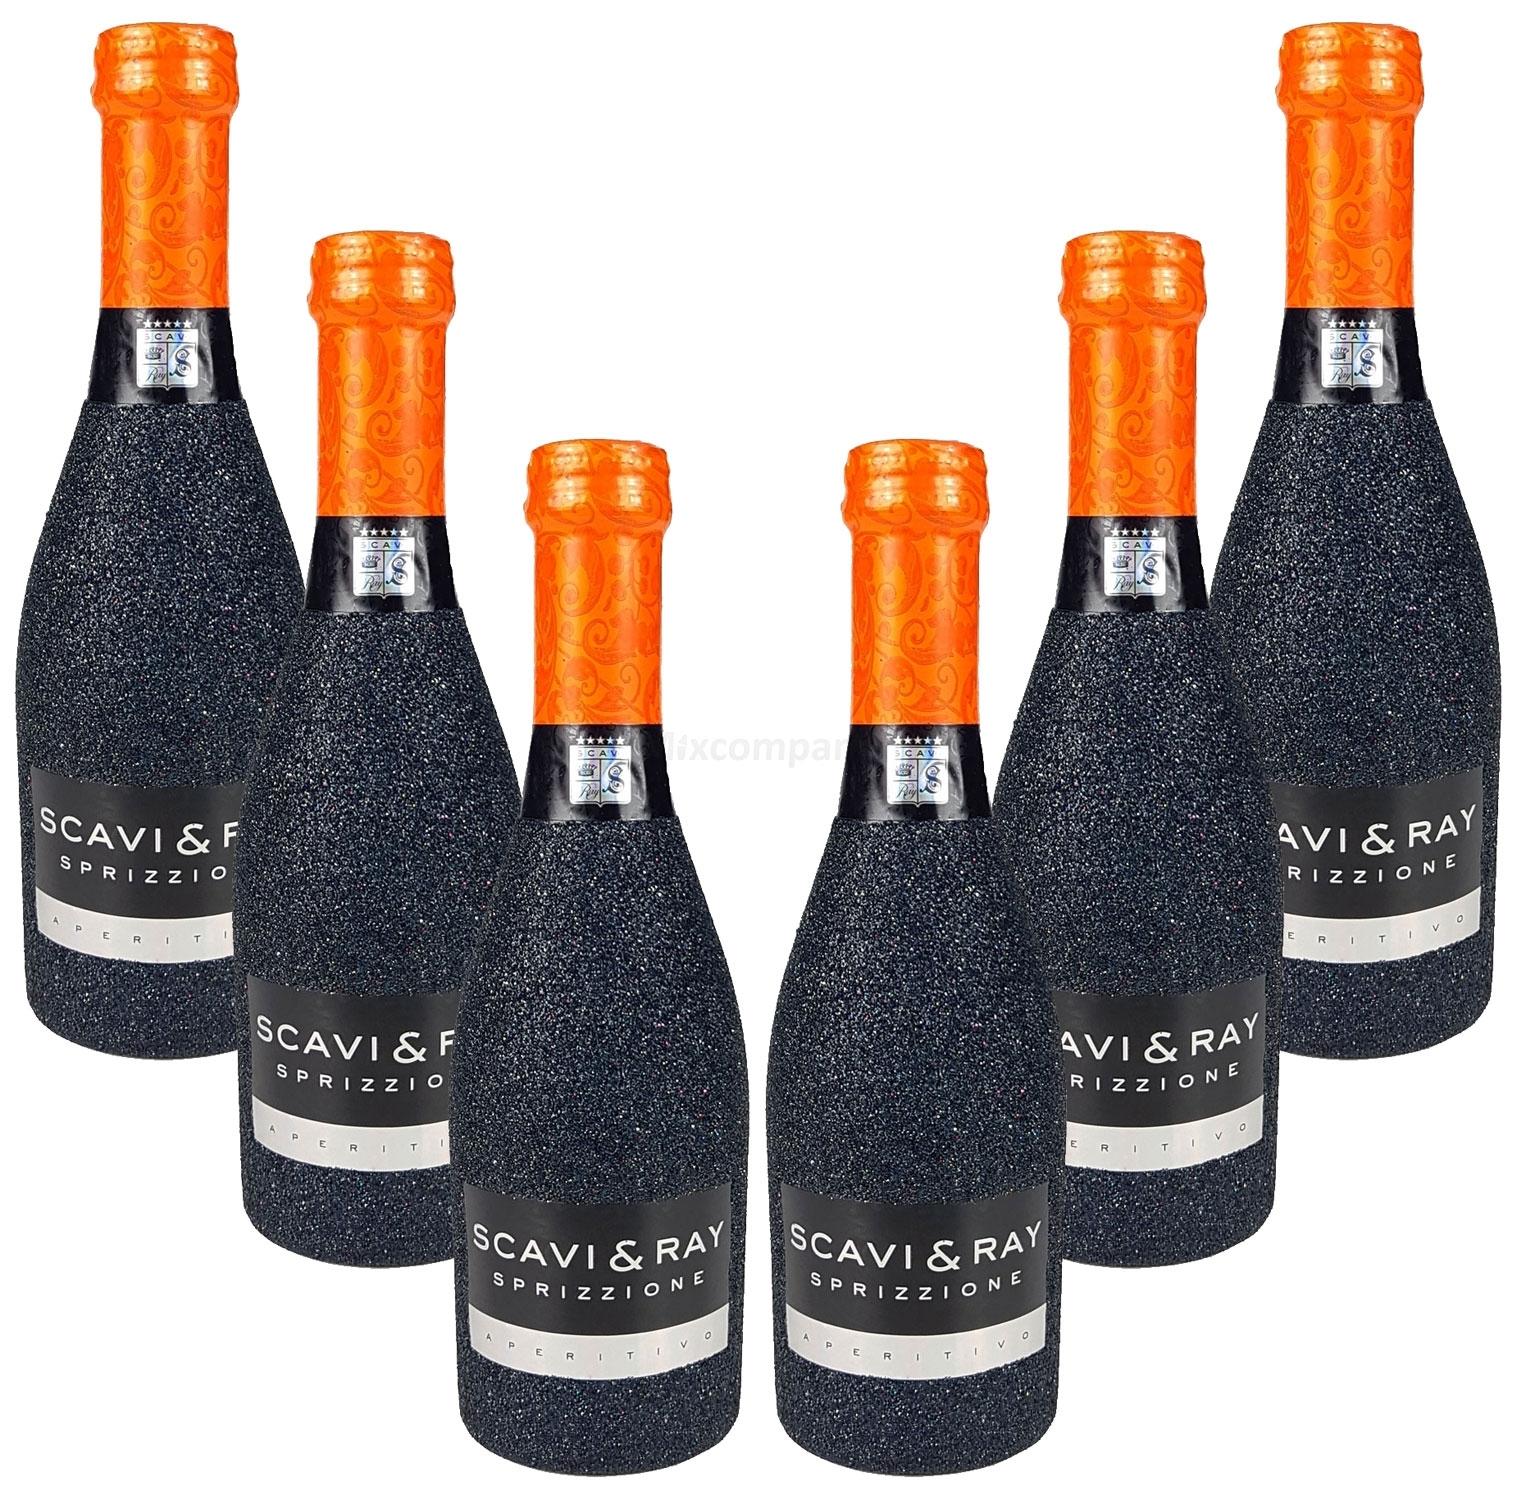 Scavi & Ray Sprizzione Aperitivo 20cl (8% Vol) - Bling Bling Glitzerflasche in schwarz Aktion - 6 Stück (6x 0,2l = 1,2l) -[Enthält Sulfite]